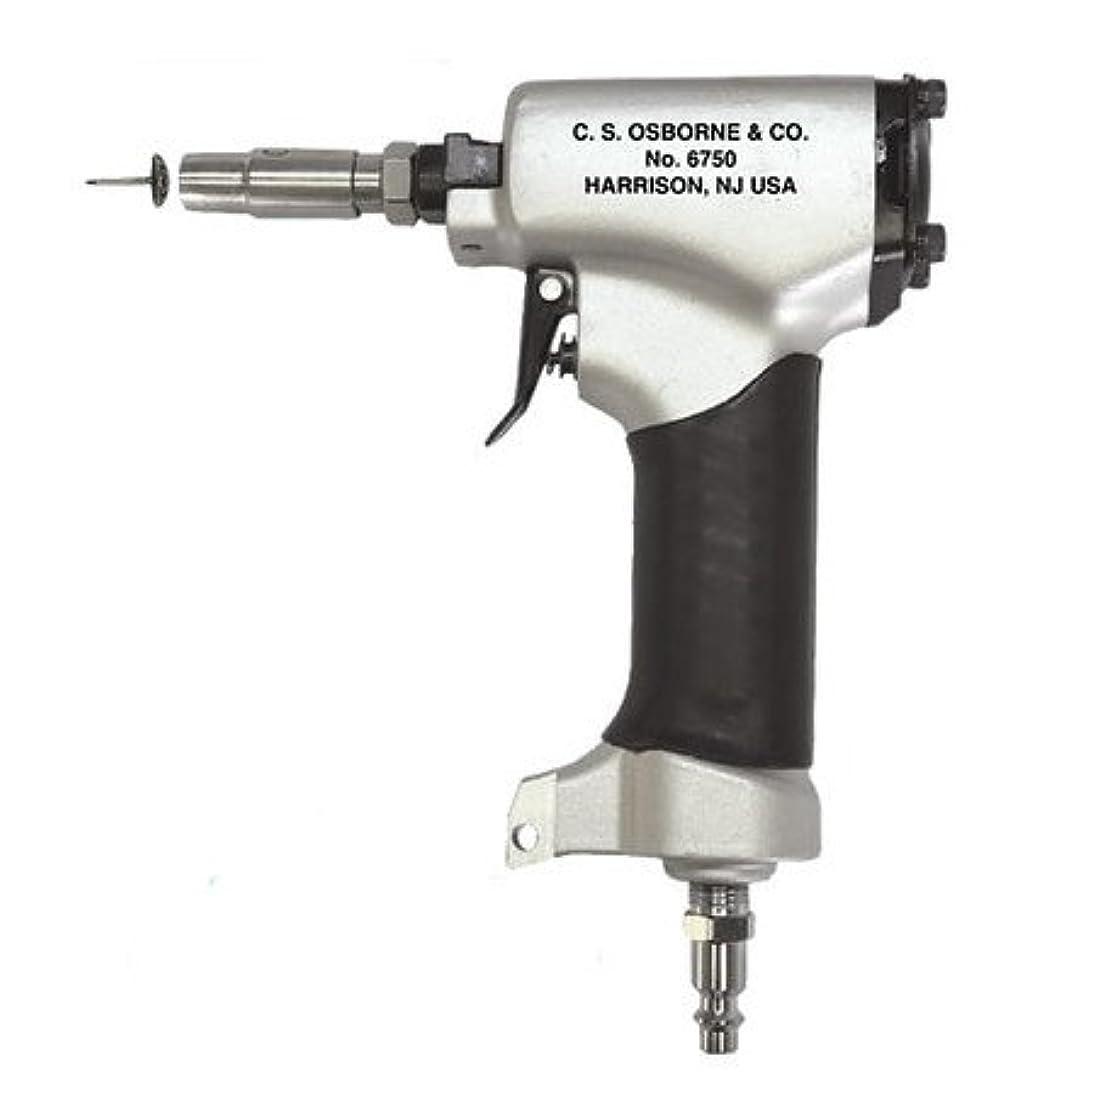 C.S. Osborne & Co. 6750 Pneumatic Decorative nail gun. (MPN # 76286)